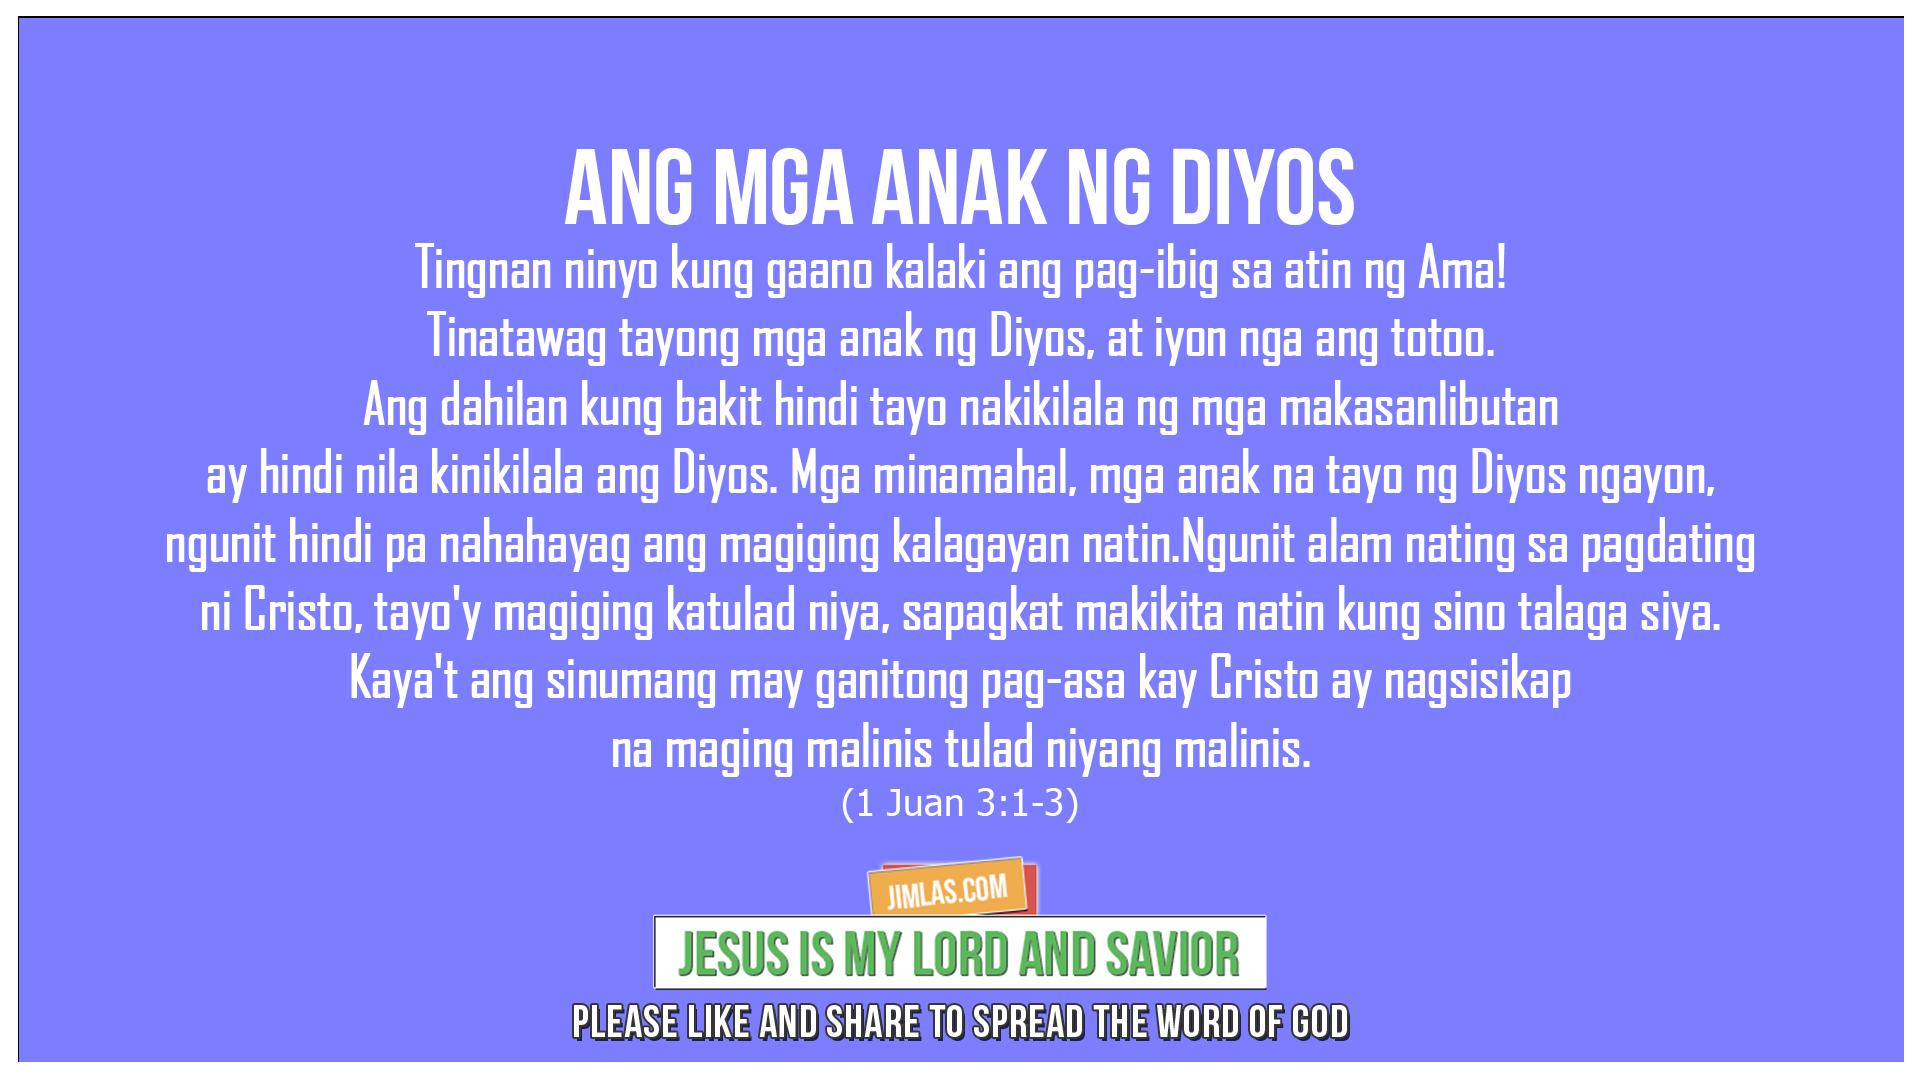 1 Juan 3:1-3, 1 Juan 3:1-3